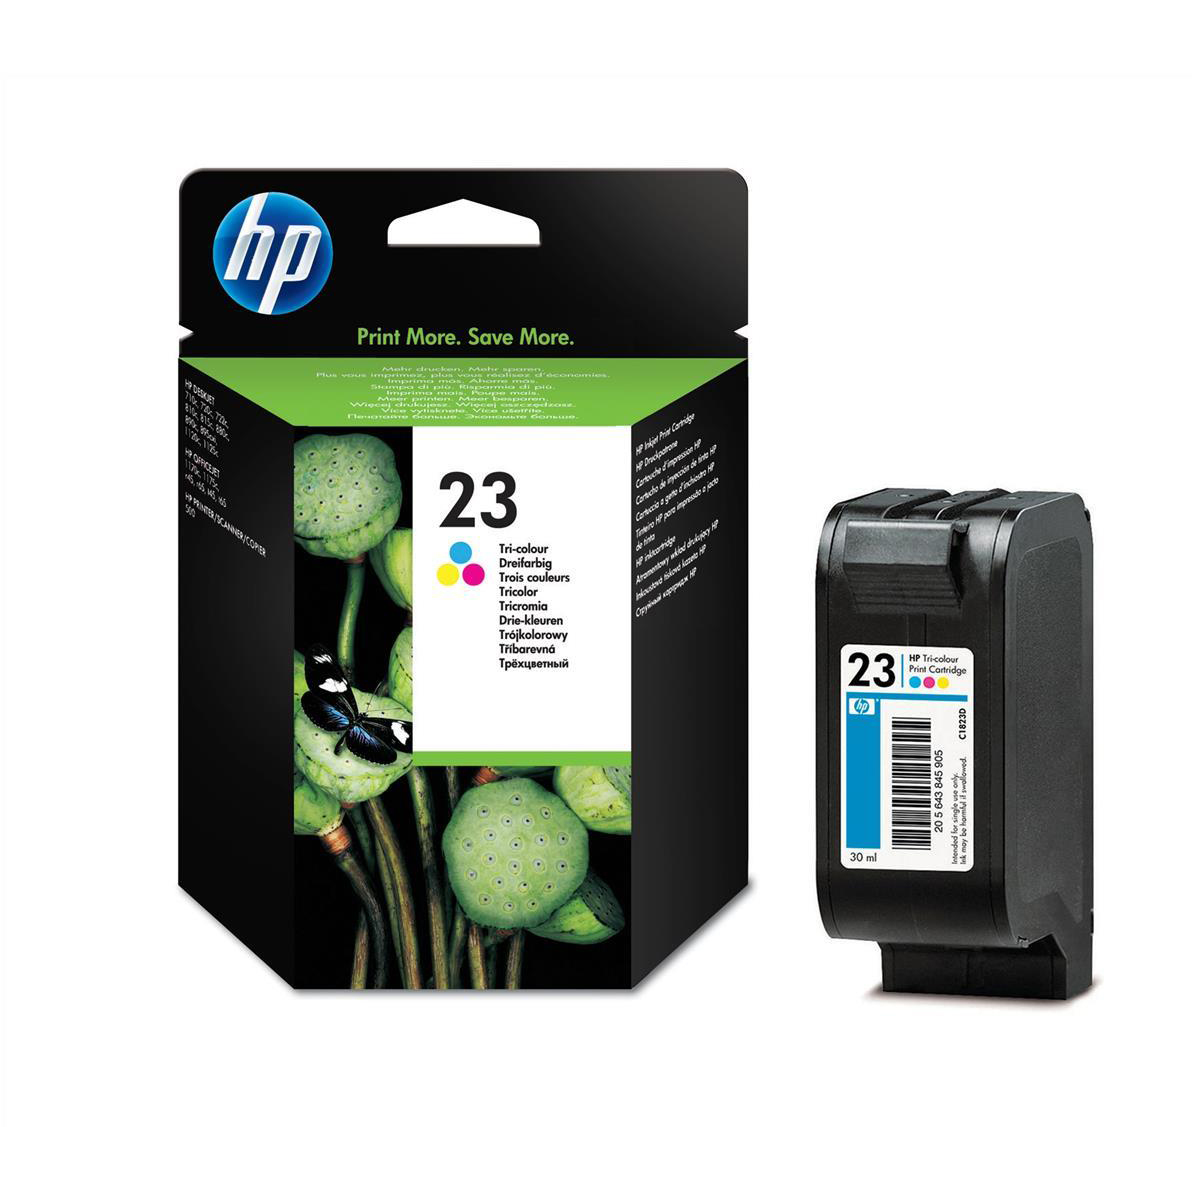 Ink cartridges Hewlett Packard HP No.23 Inkjet Cartridge Page Life 620pp 30ml Tri-Colour Ref C1823D